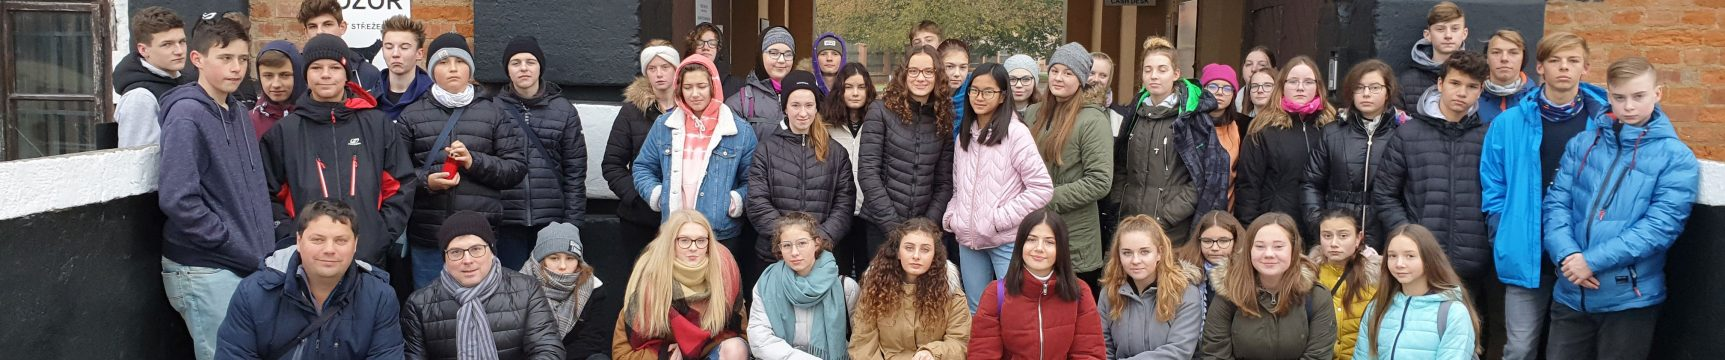 Exkurze žáků ZŠ Unesco do Terezína a Lidic